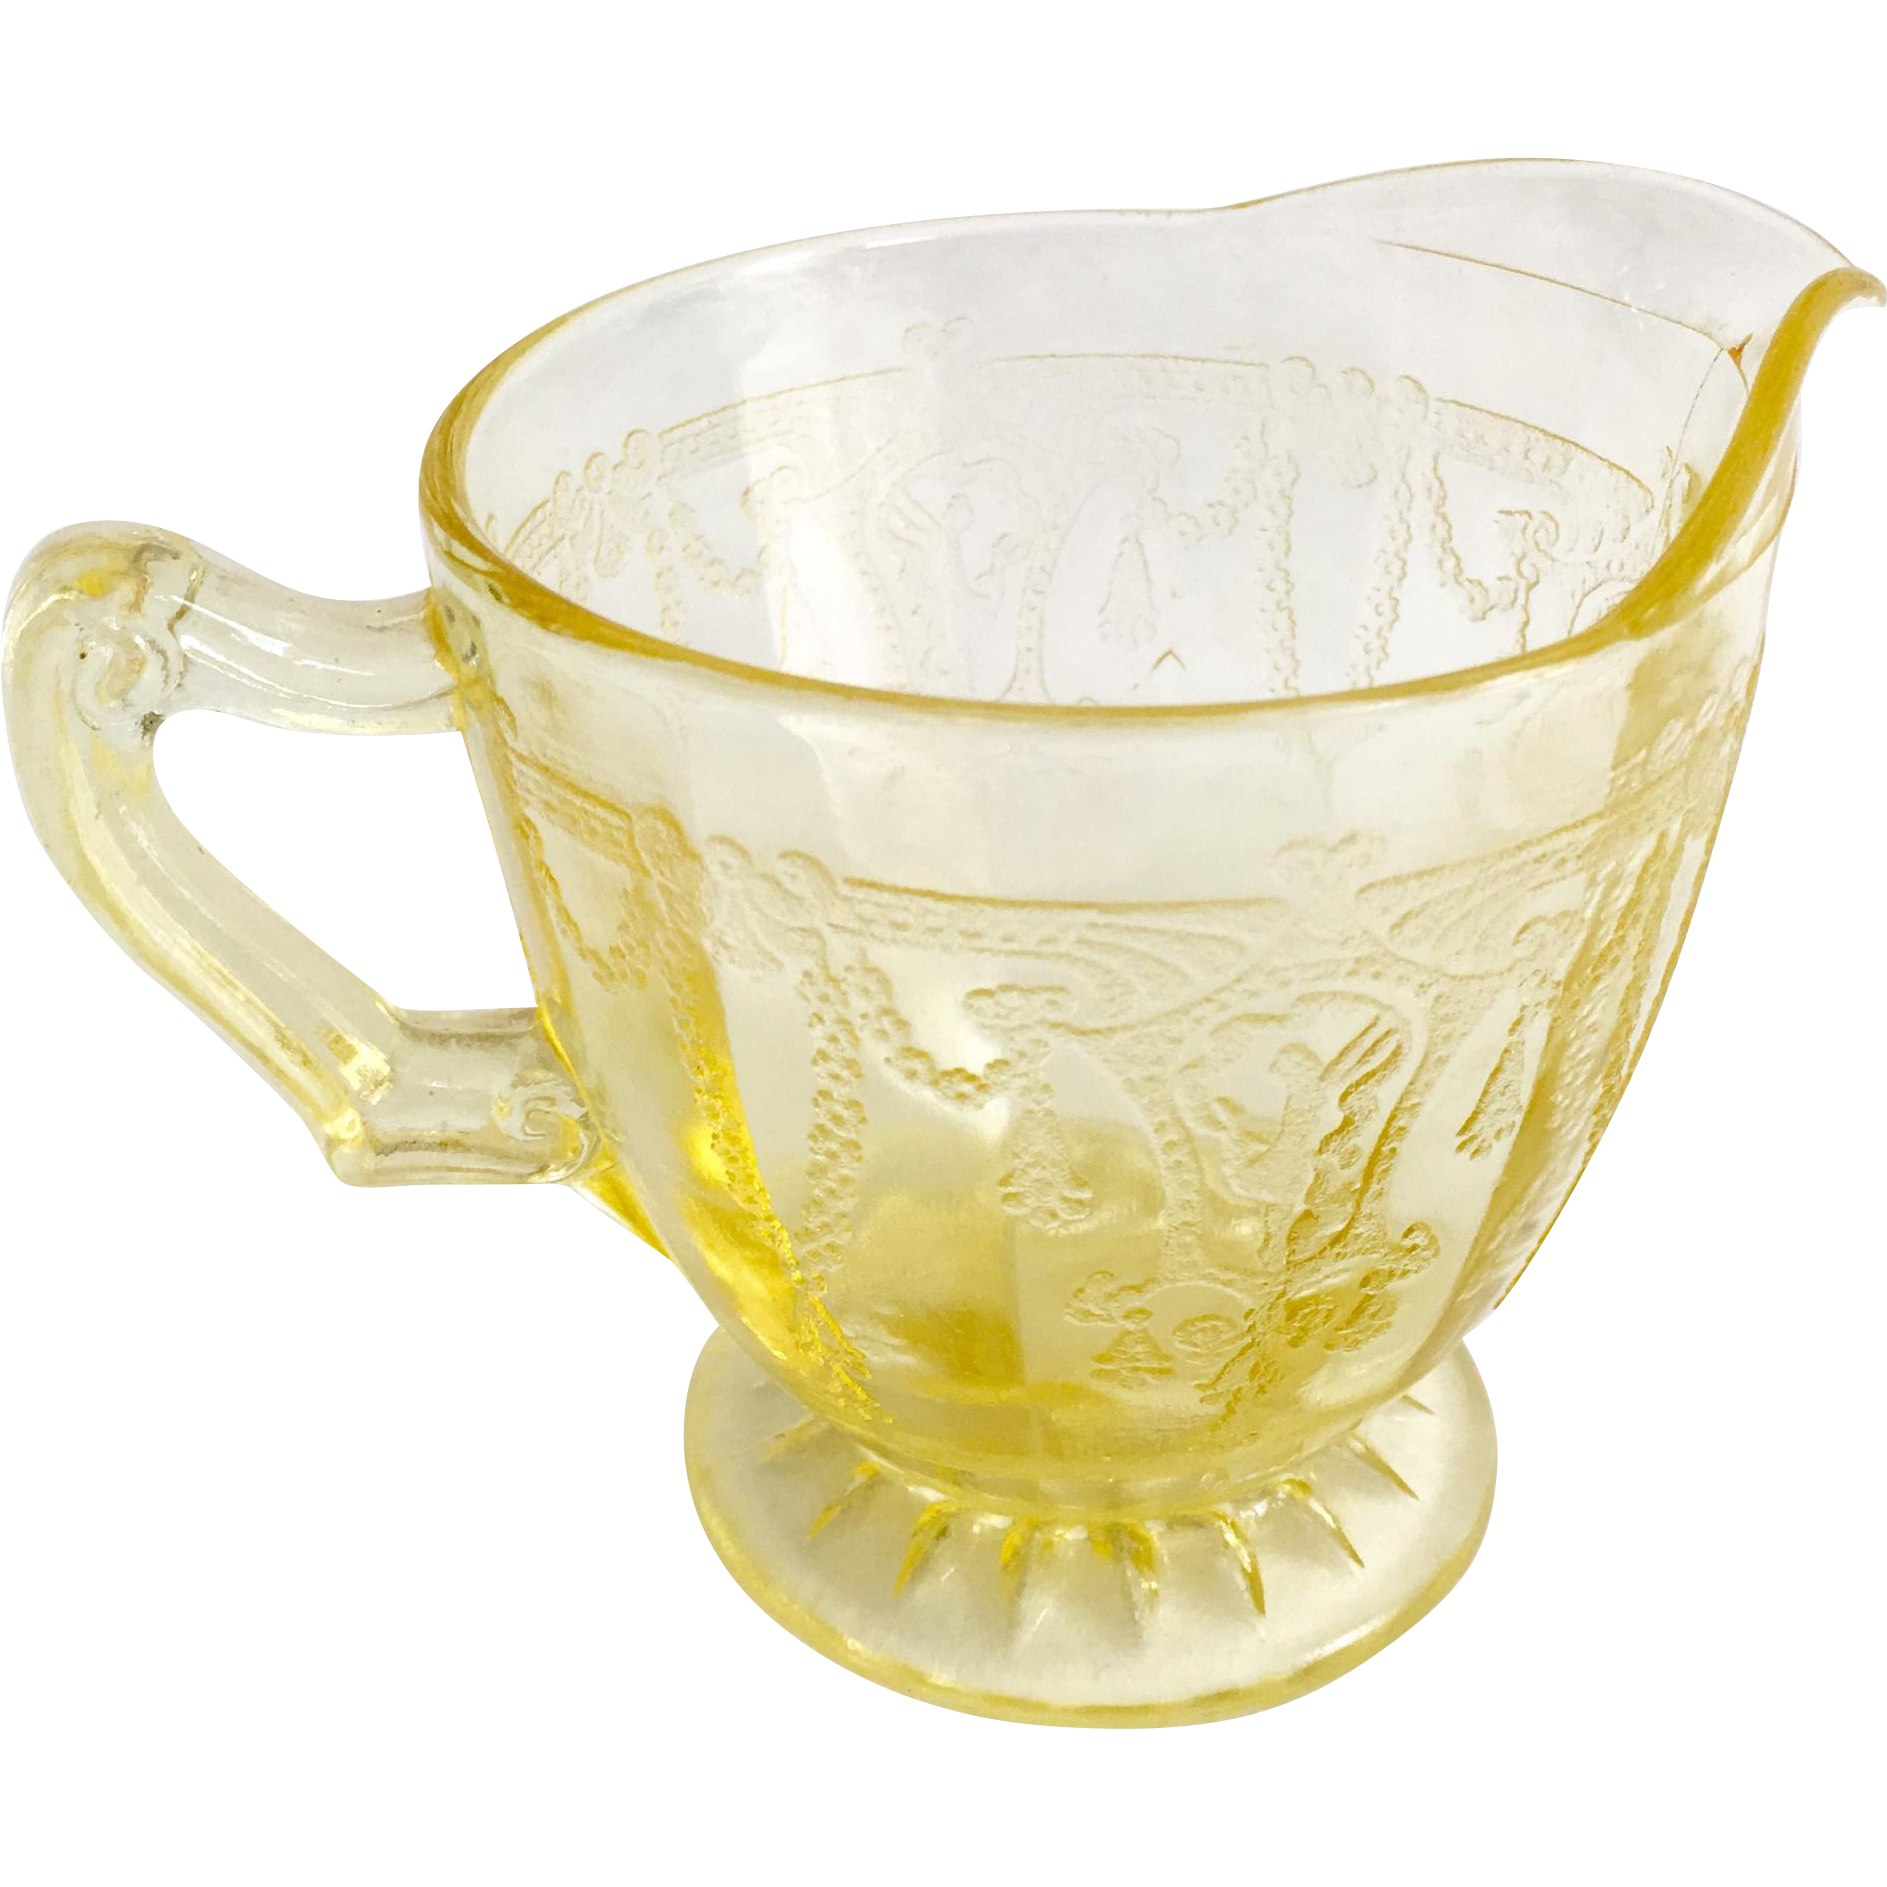 Hocking Cameo Ballerina Yellow Depression Glass Creamer